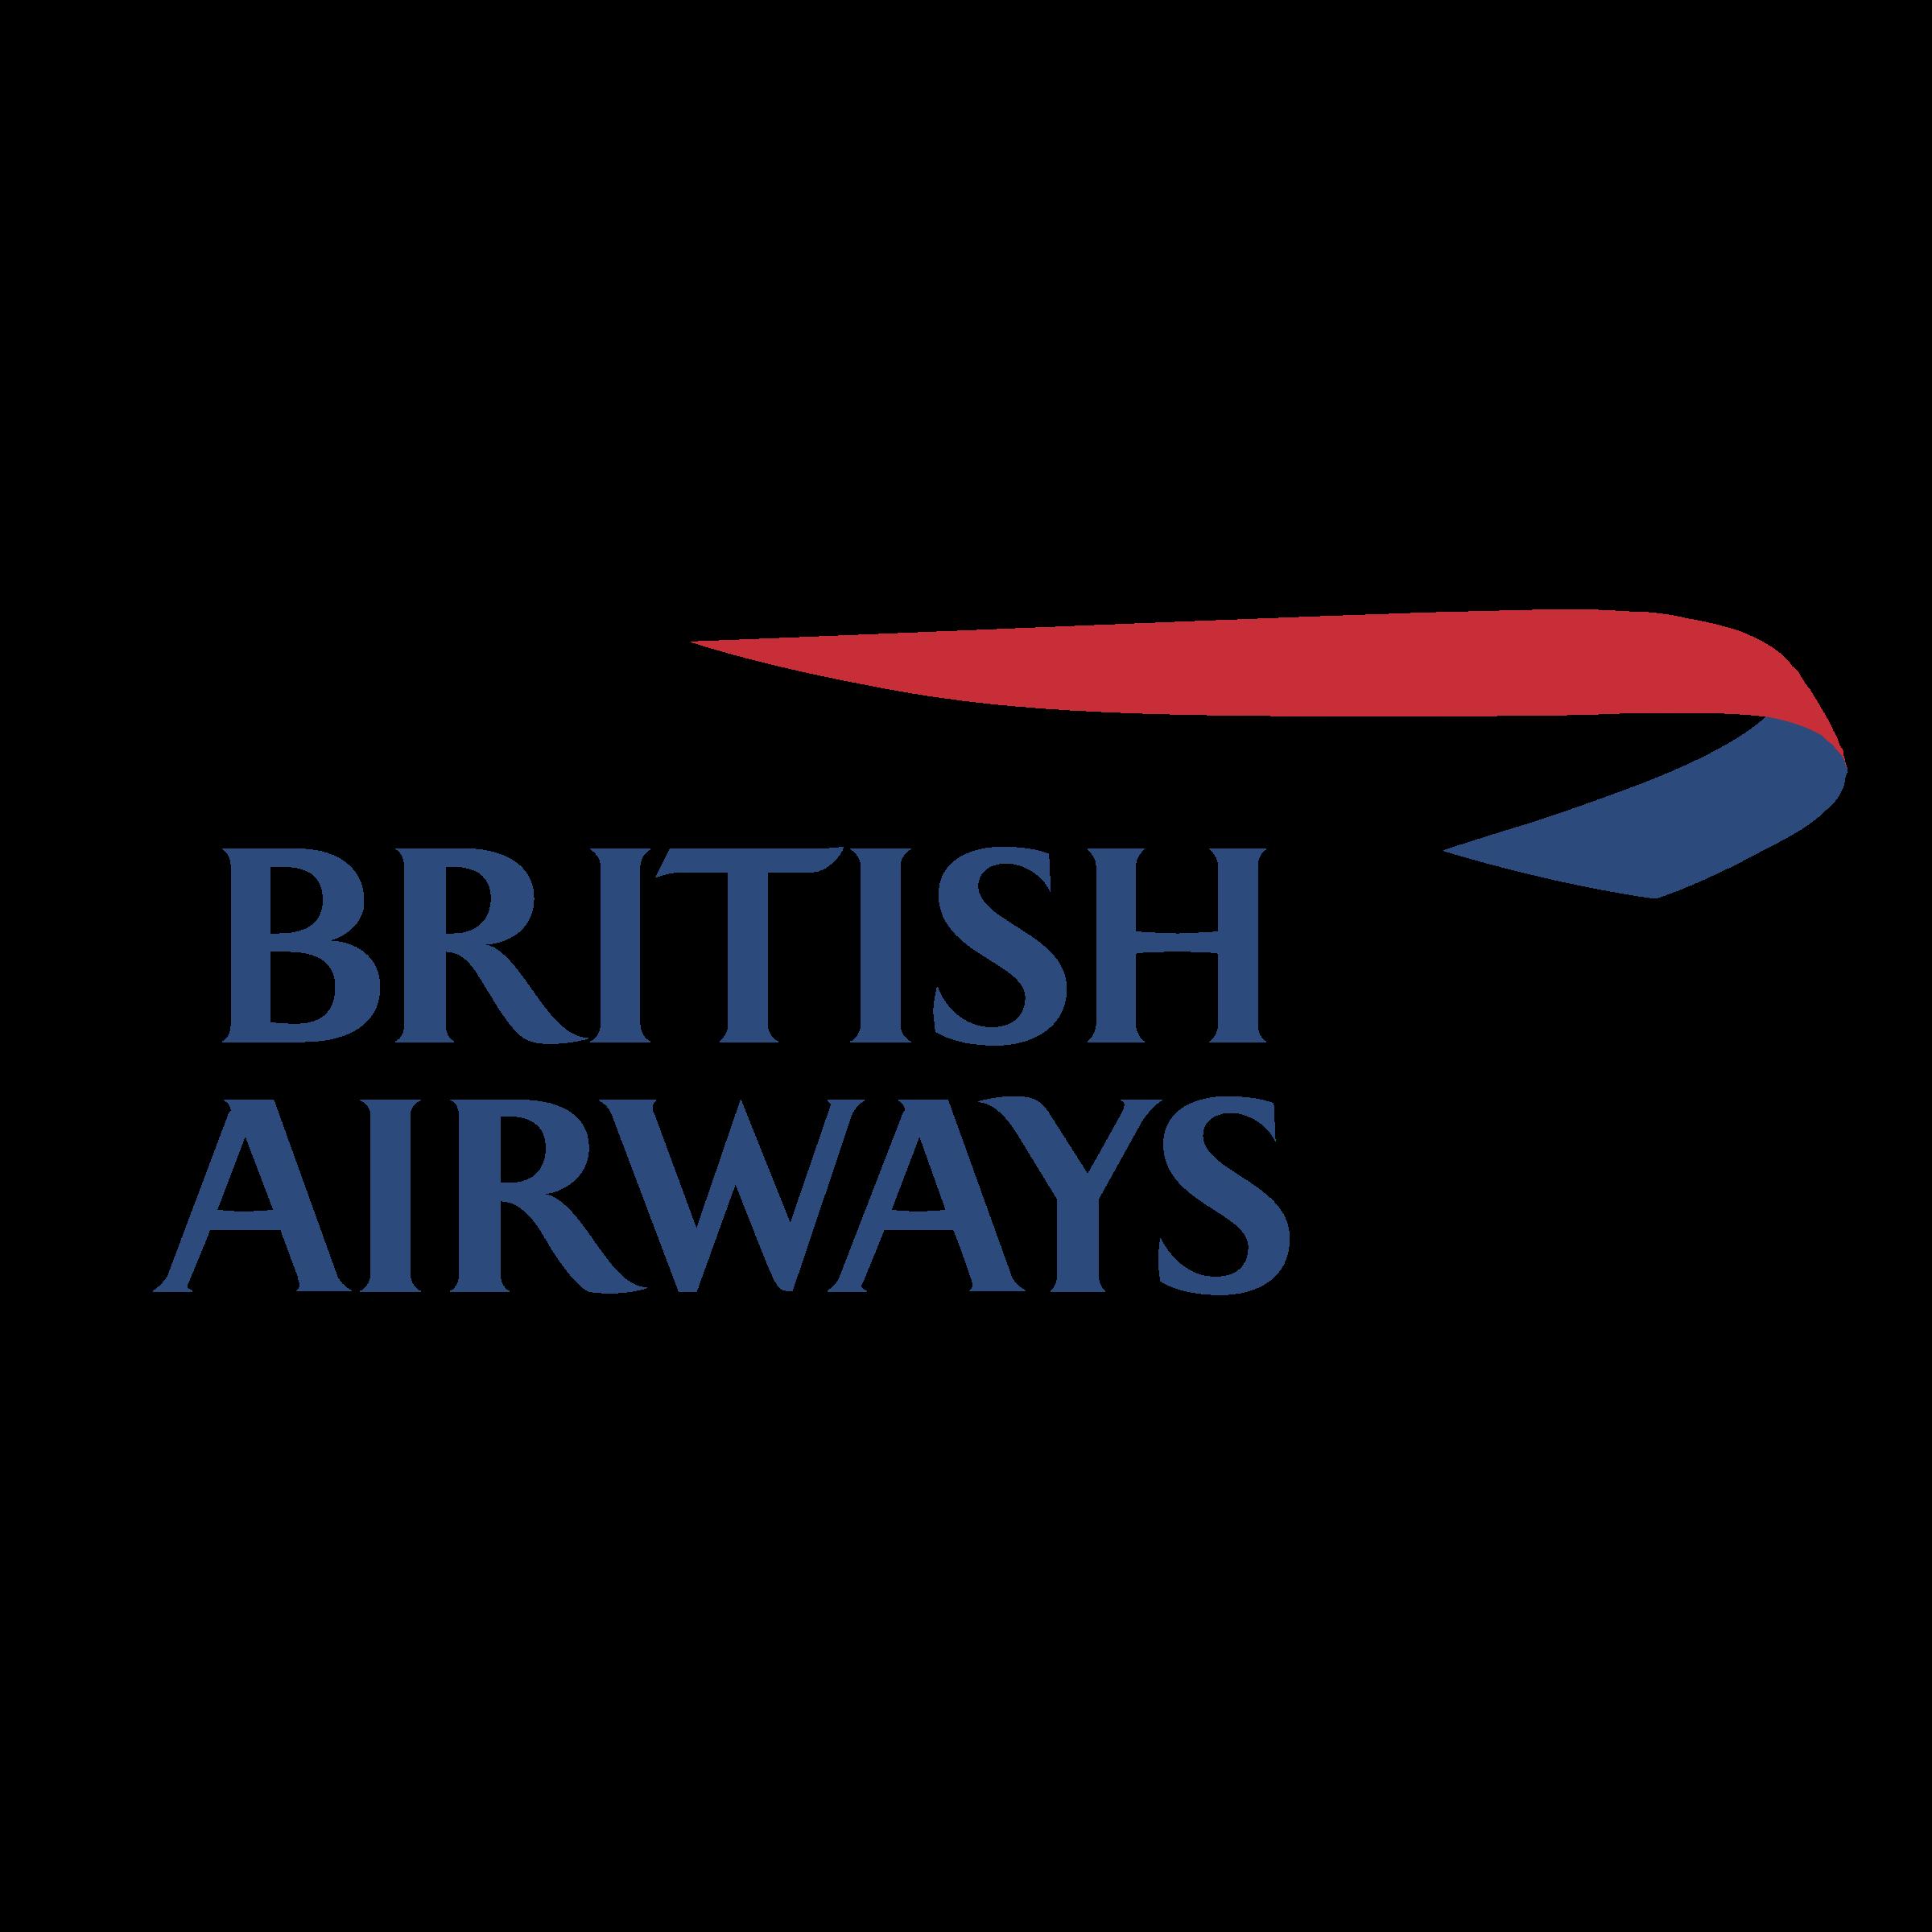 British Airways 01 Logo PNG Transparent & SVG Vector.